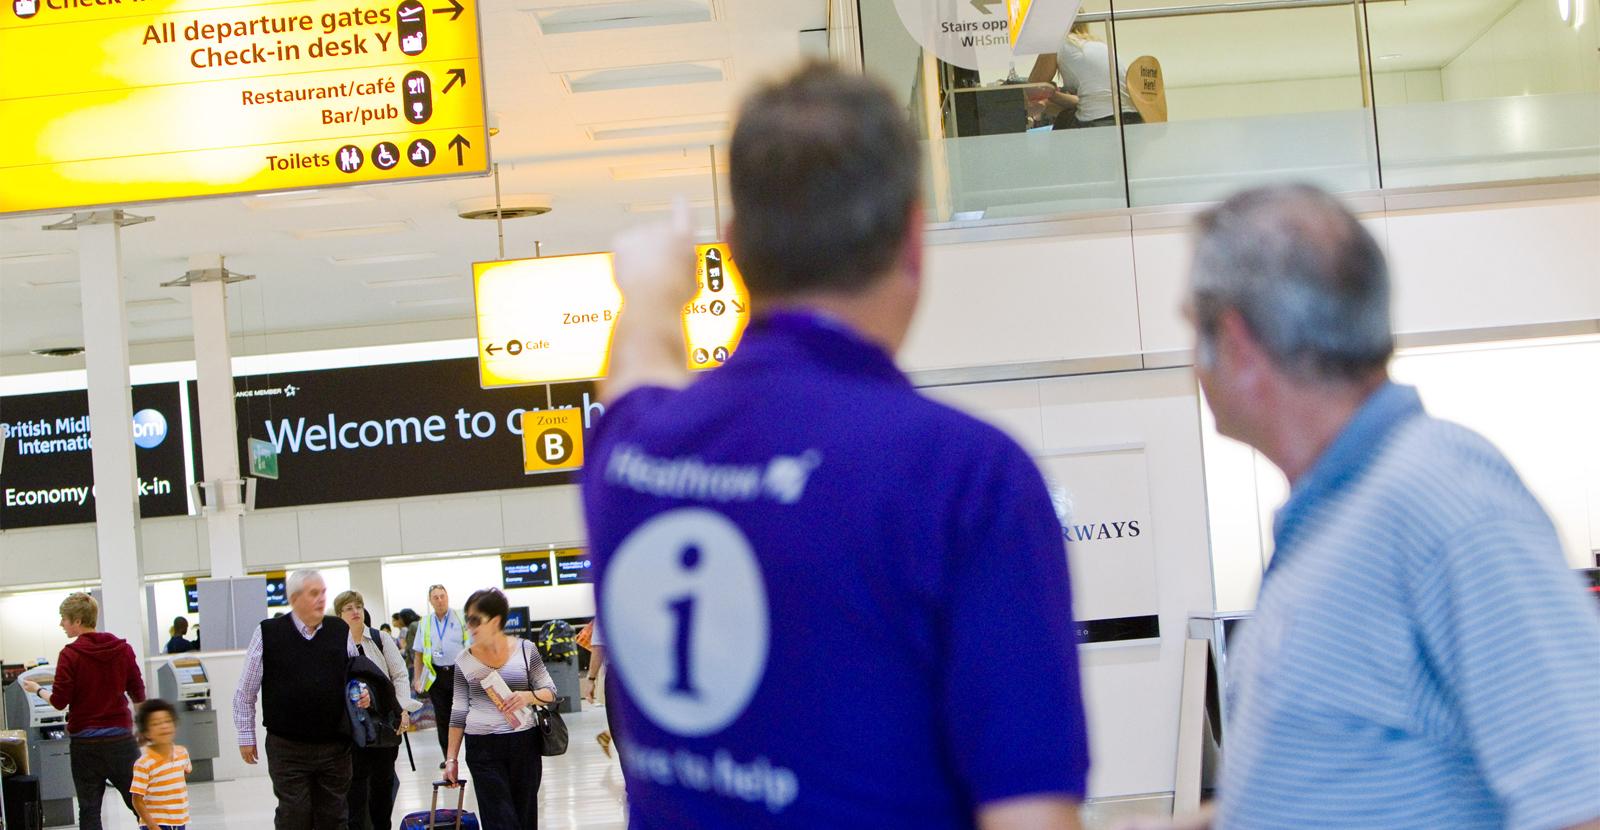 london heathrow airport service standard by engine